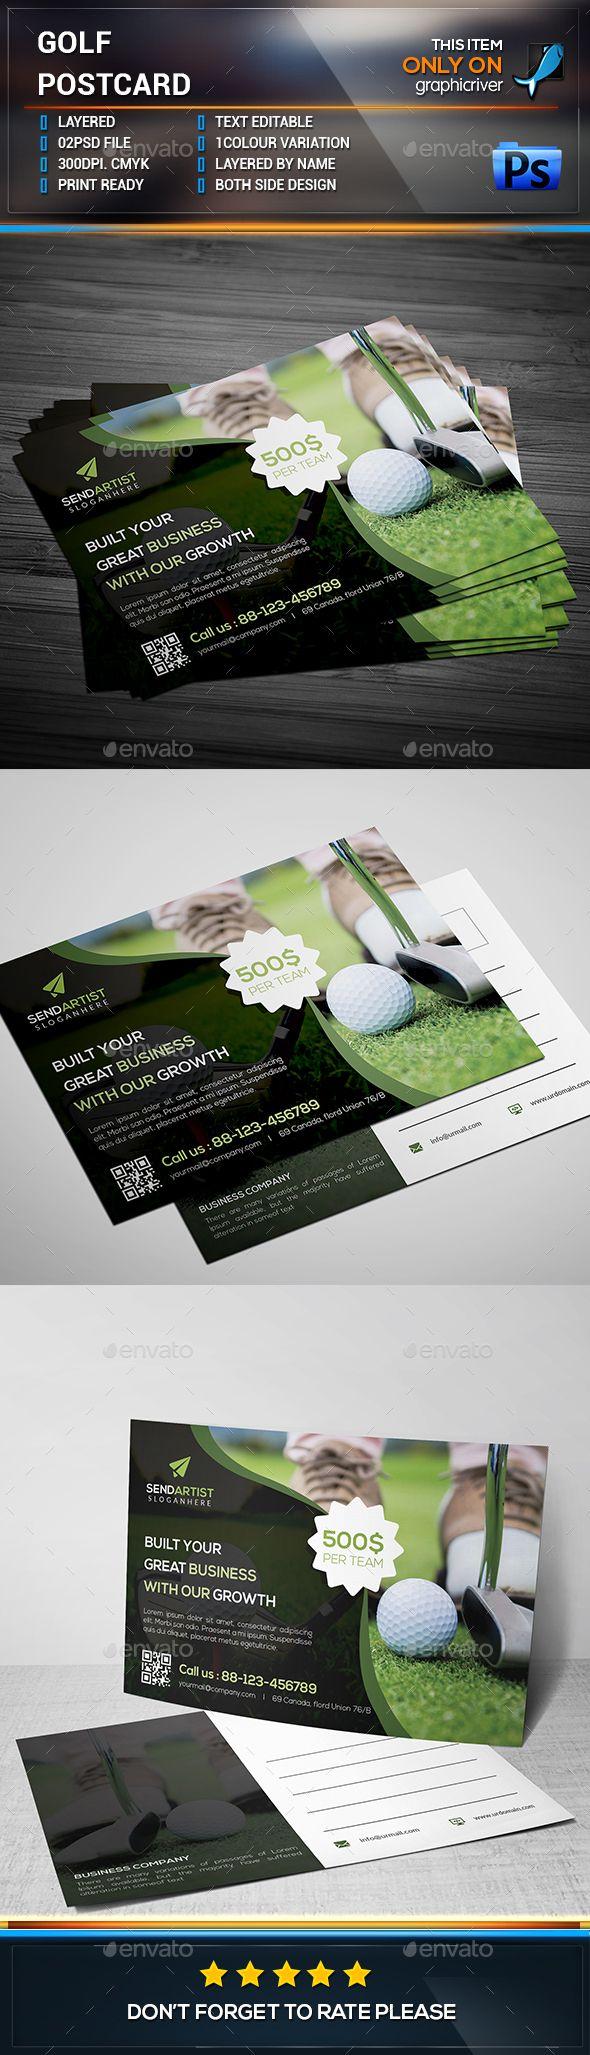 Golf Post Card Templates